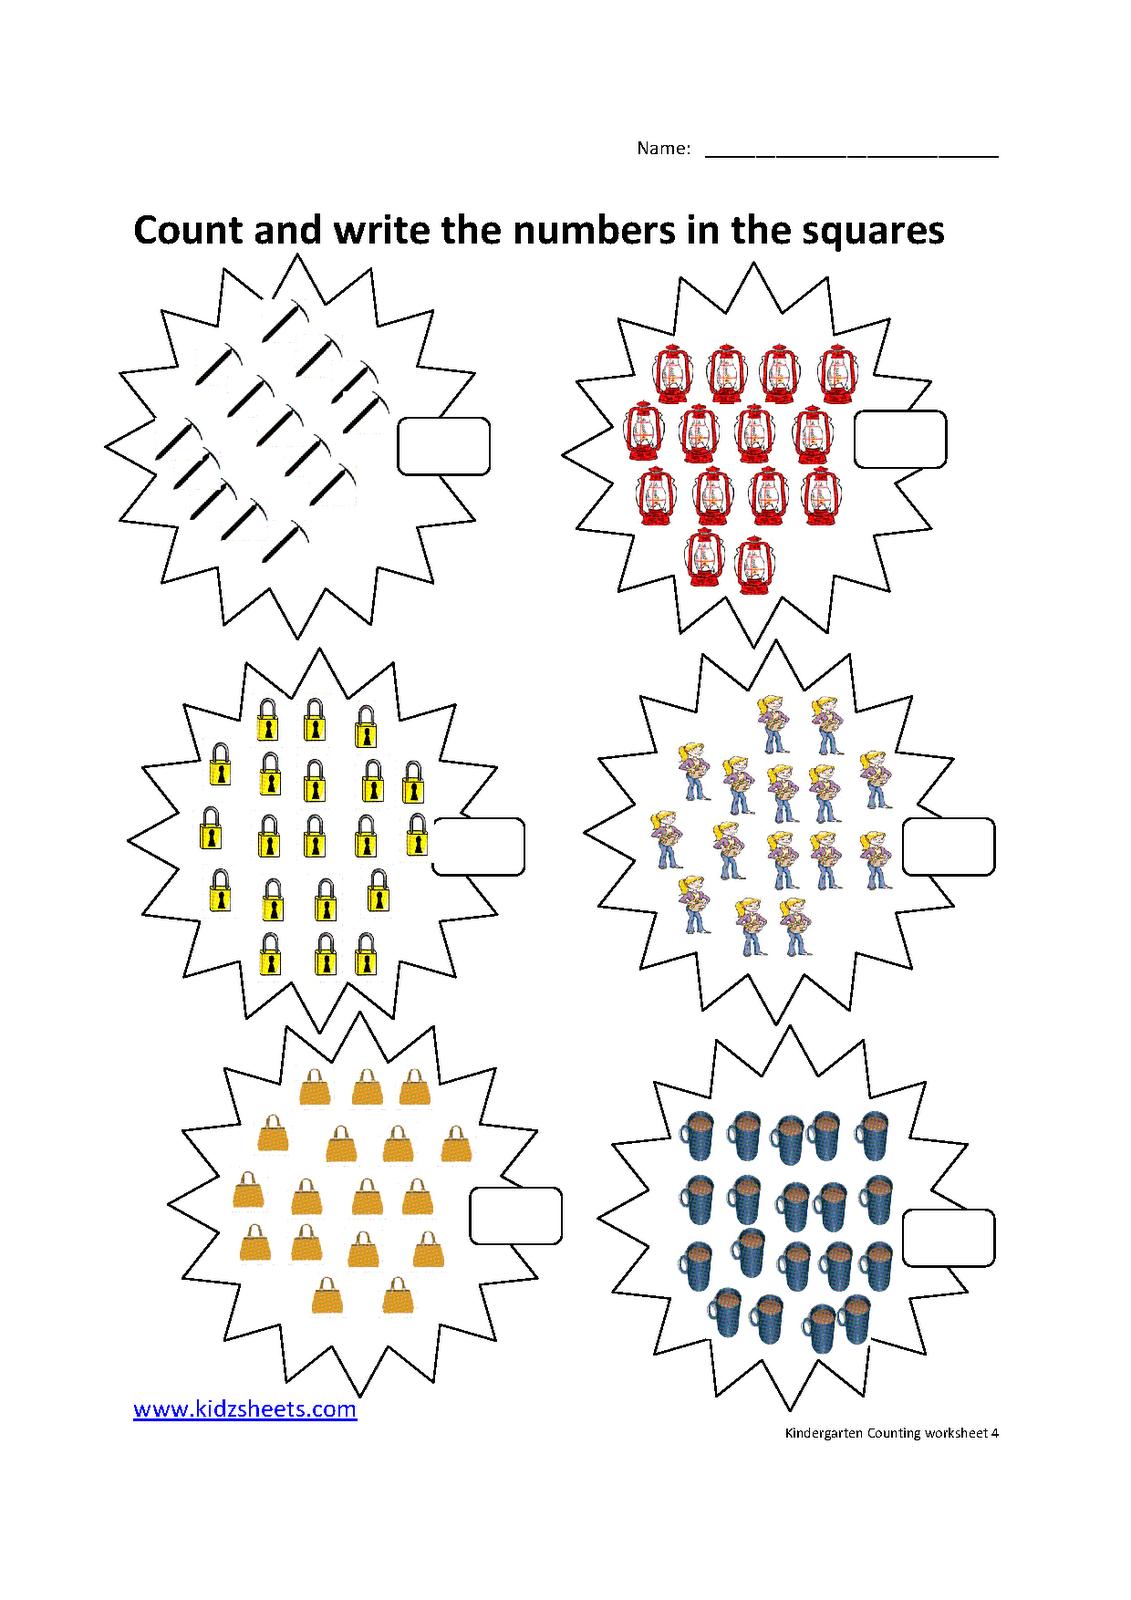 math worksheet : kidz worksheets kindergarten counting worksheet4 : A Worksheets For Kindergarten